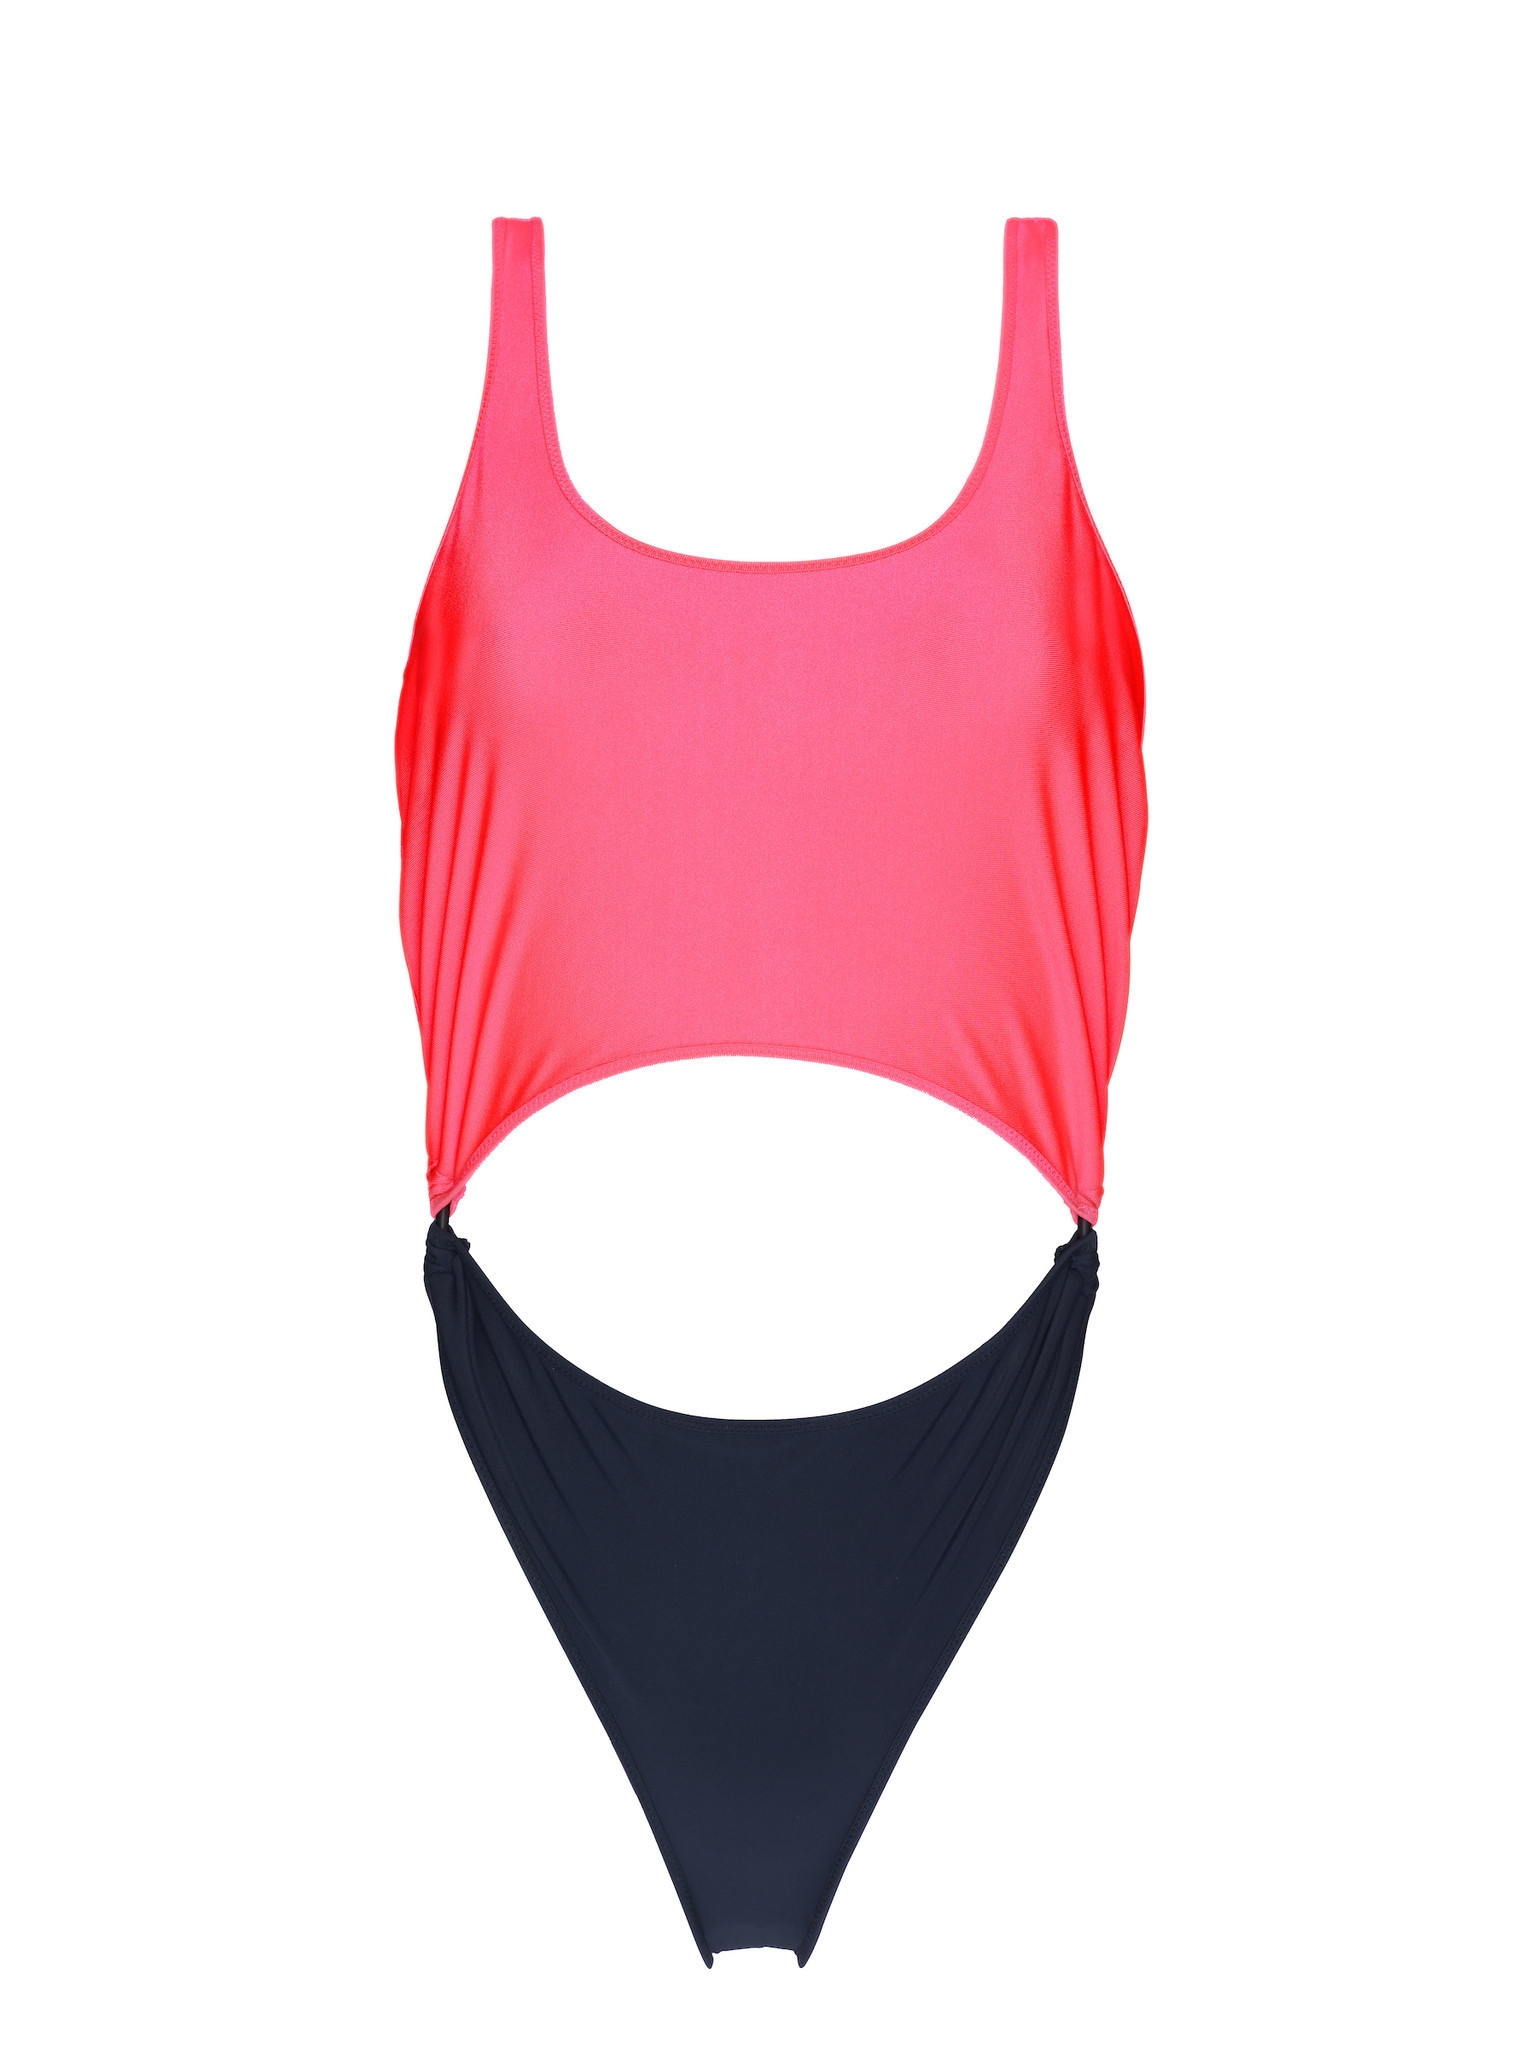 women one piece swimwear swimsuit monokini push up padded. Black Bedroom Furniture Sets. Home Design Ideas